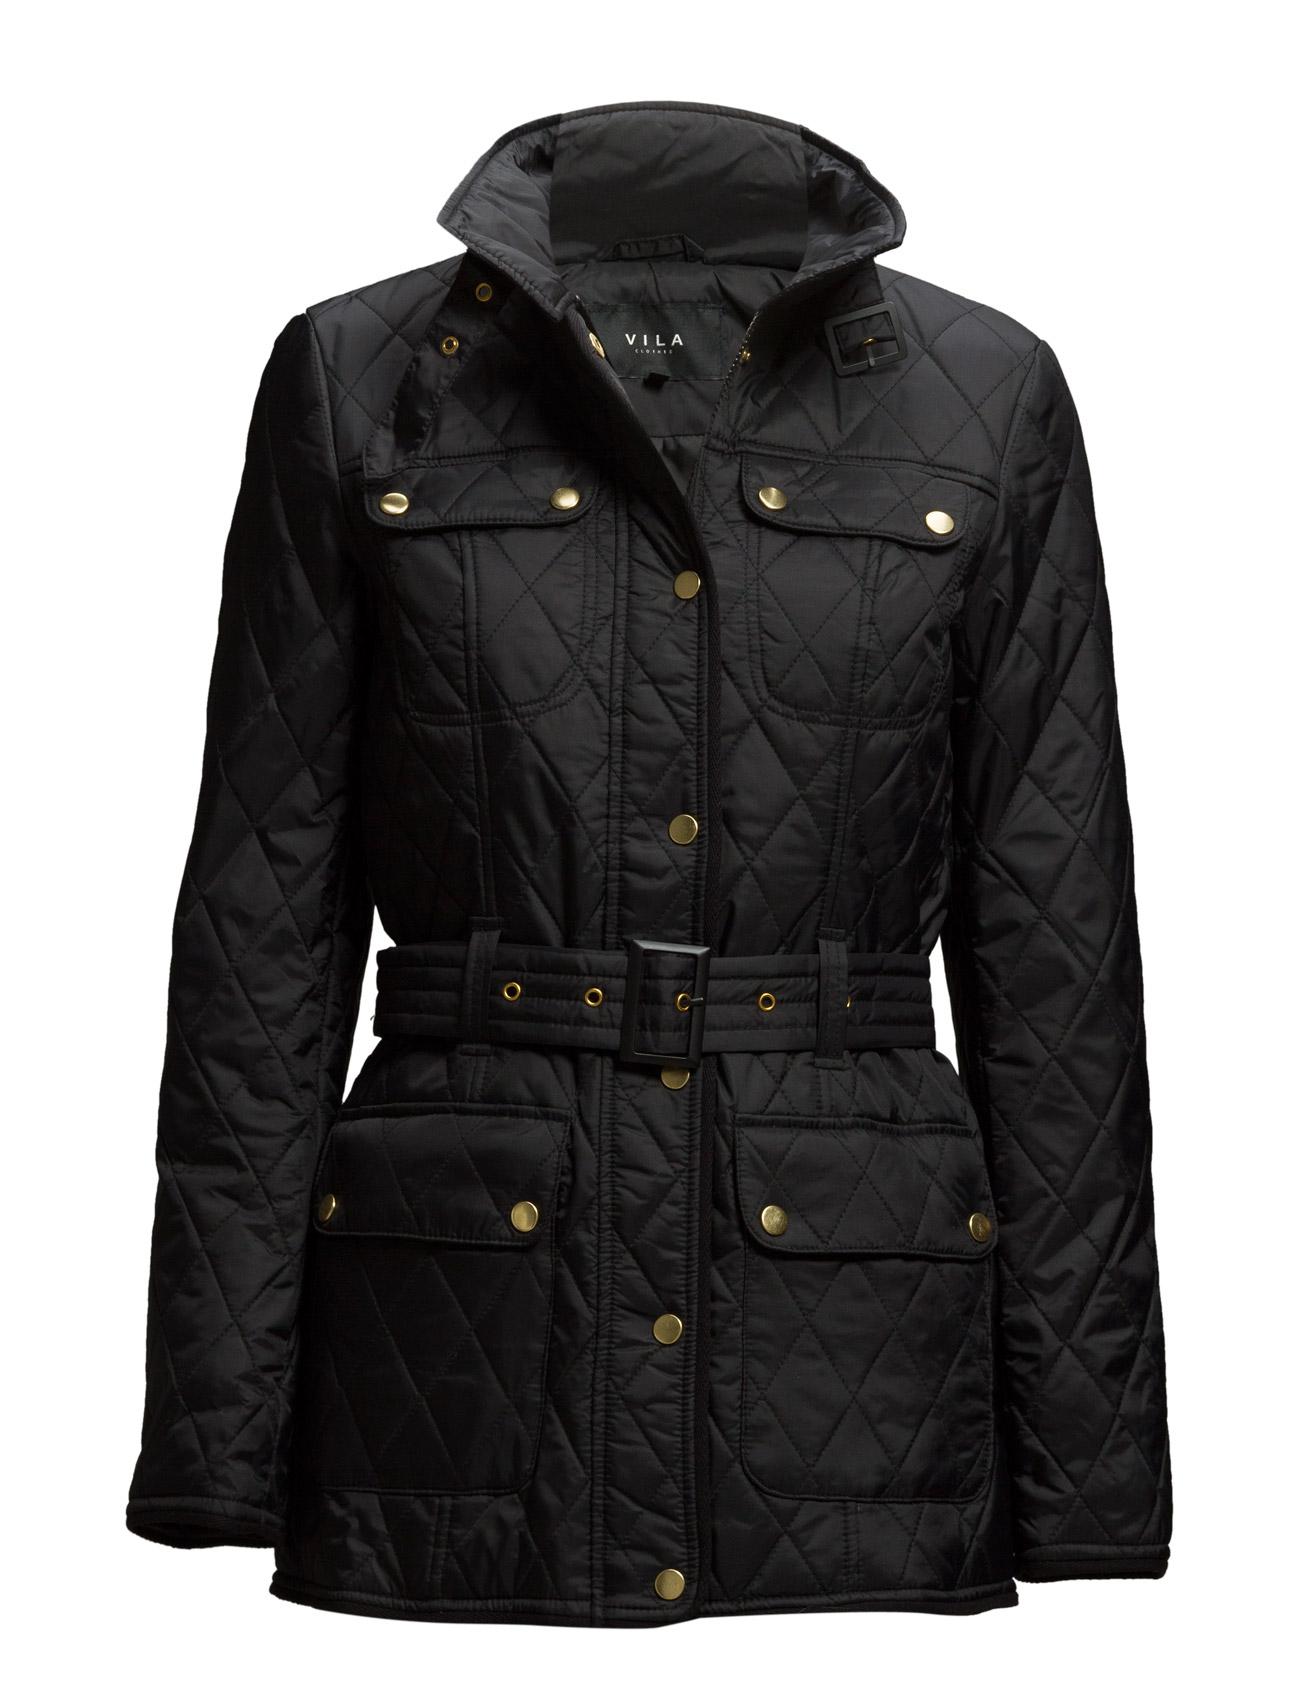 Vinormaly Jacket